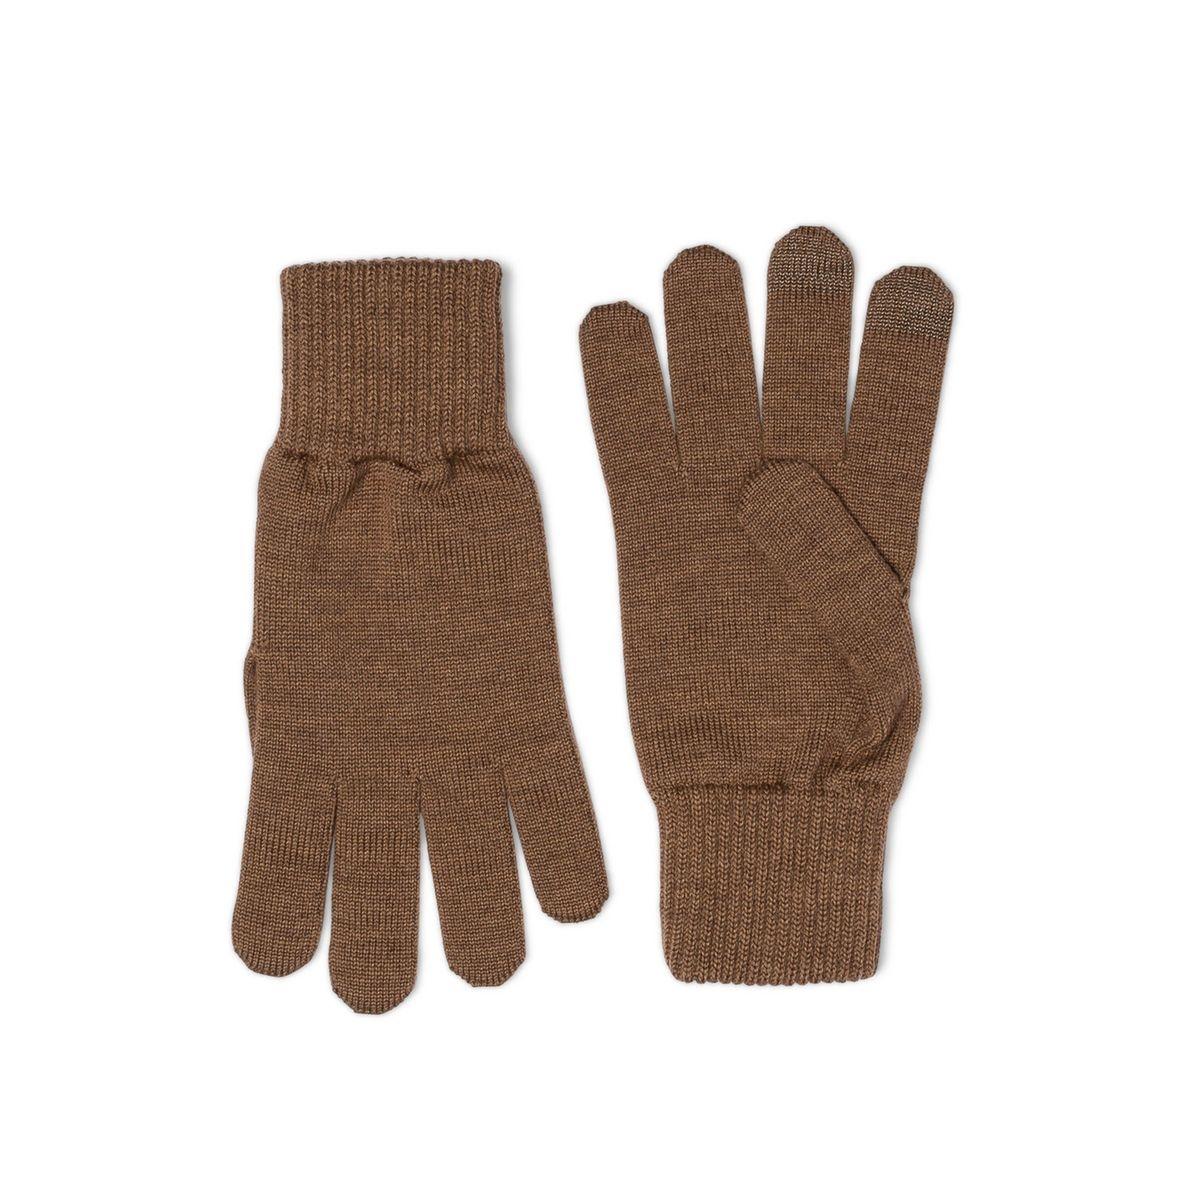 Gant tactile laine made in France PLEYNET